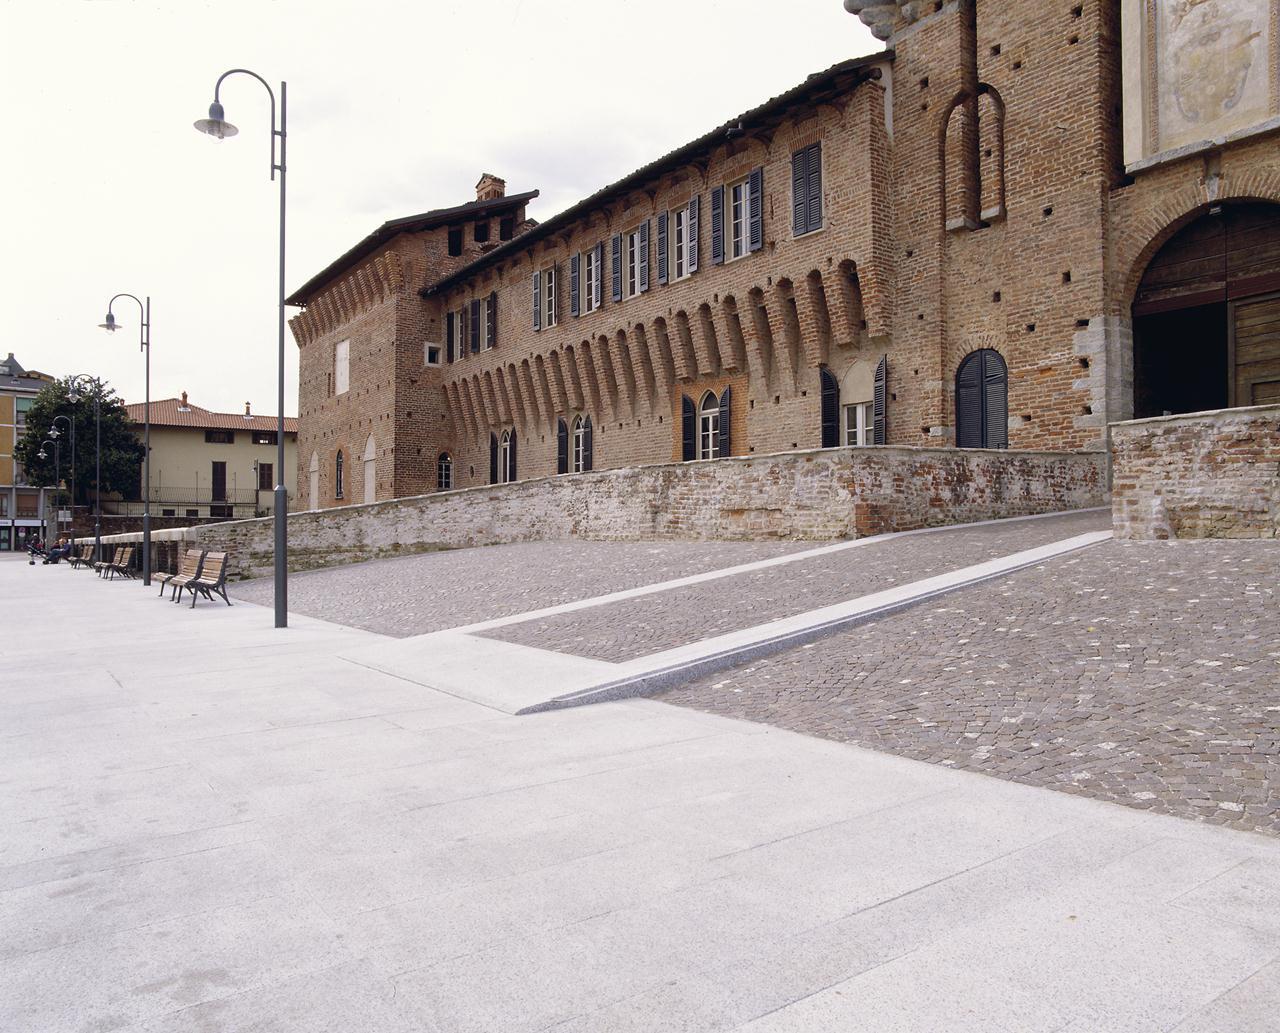 http://www.antoniolazzaretto.it/wp-content/uploads/2013/11/8-p10.jpg